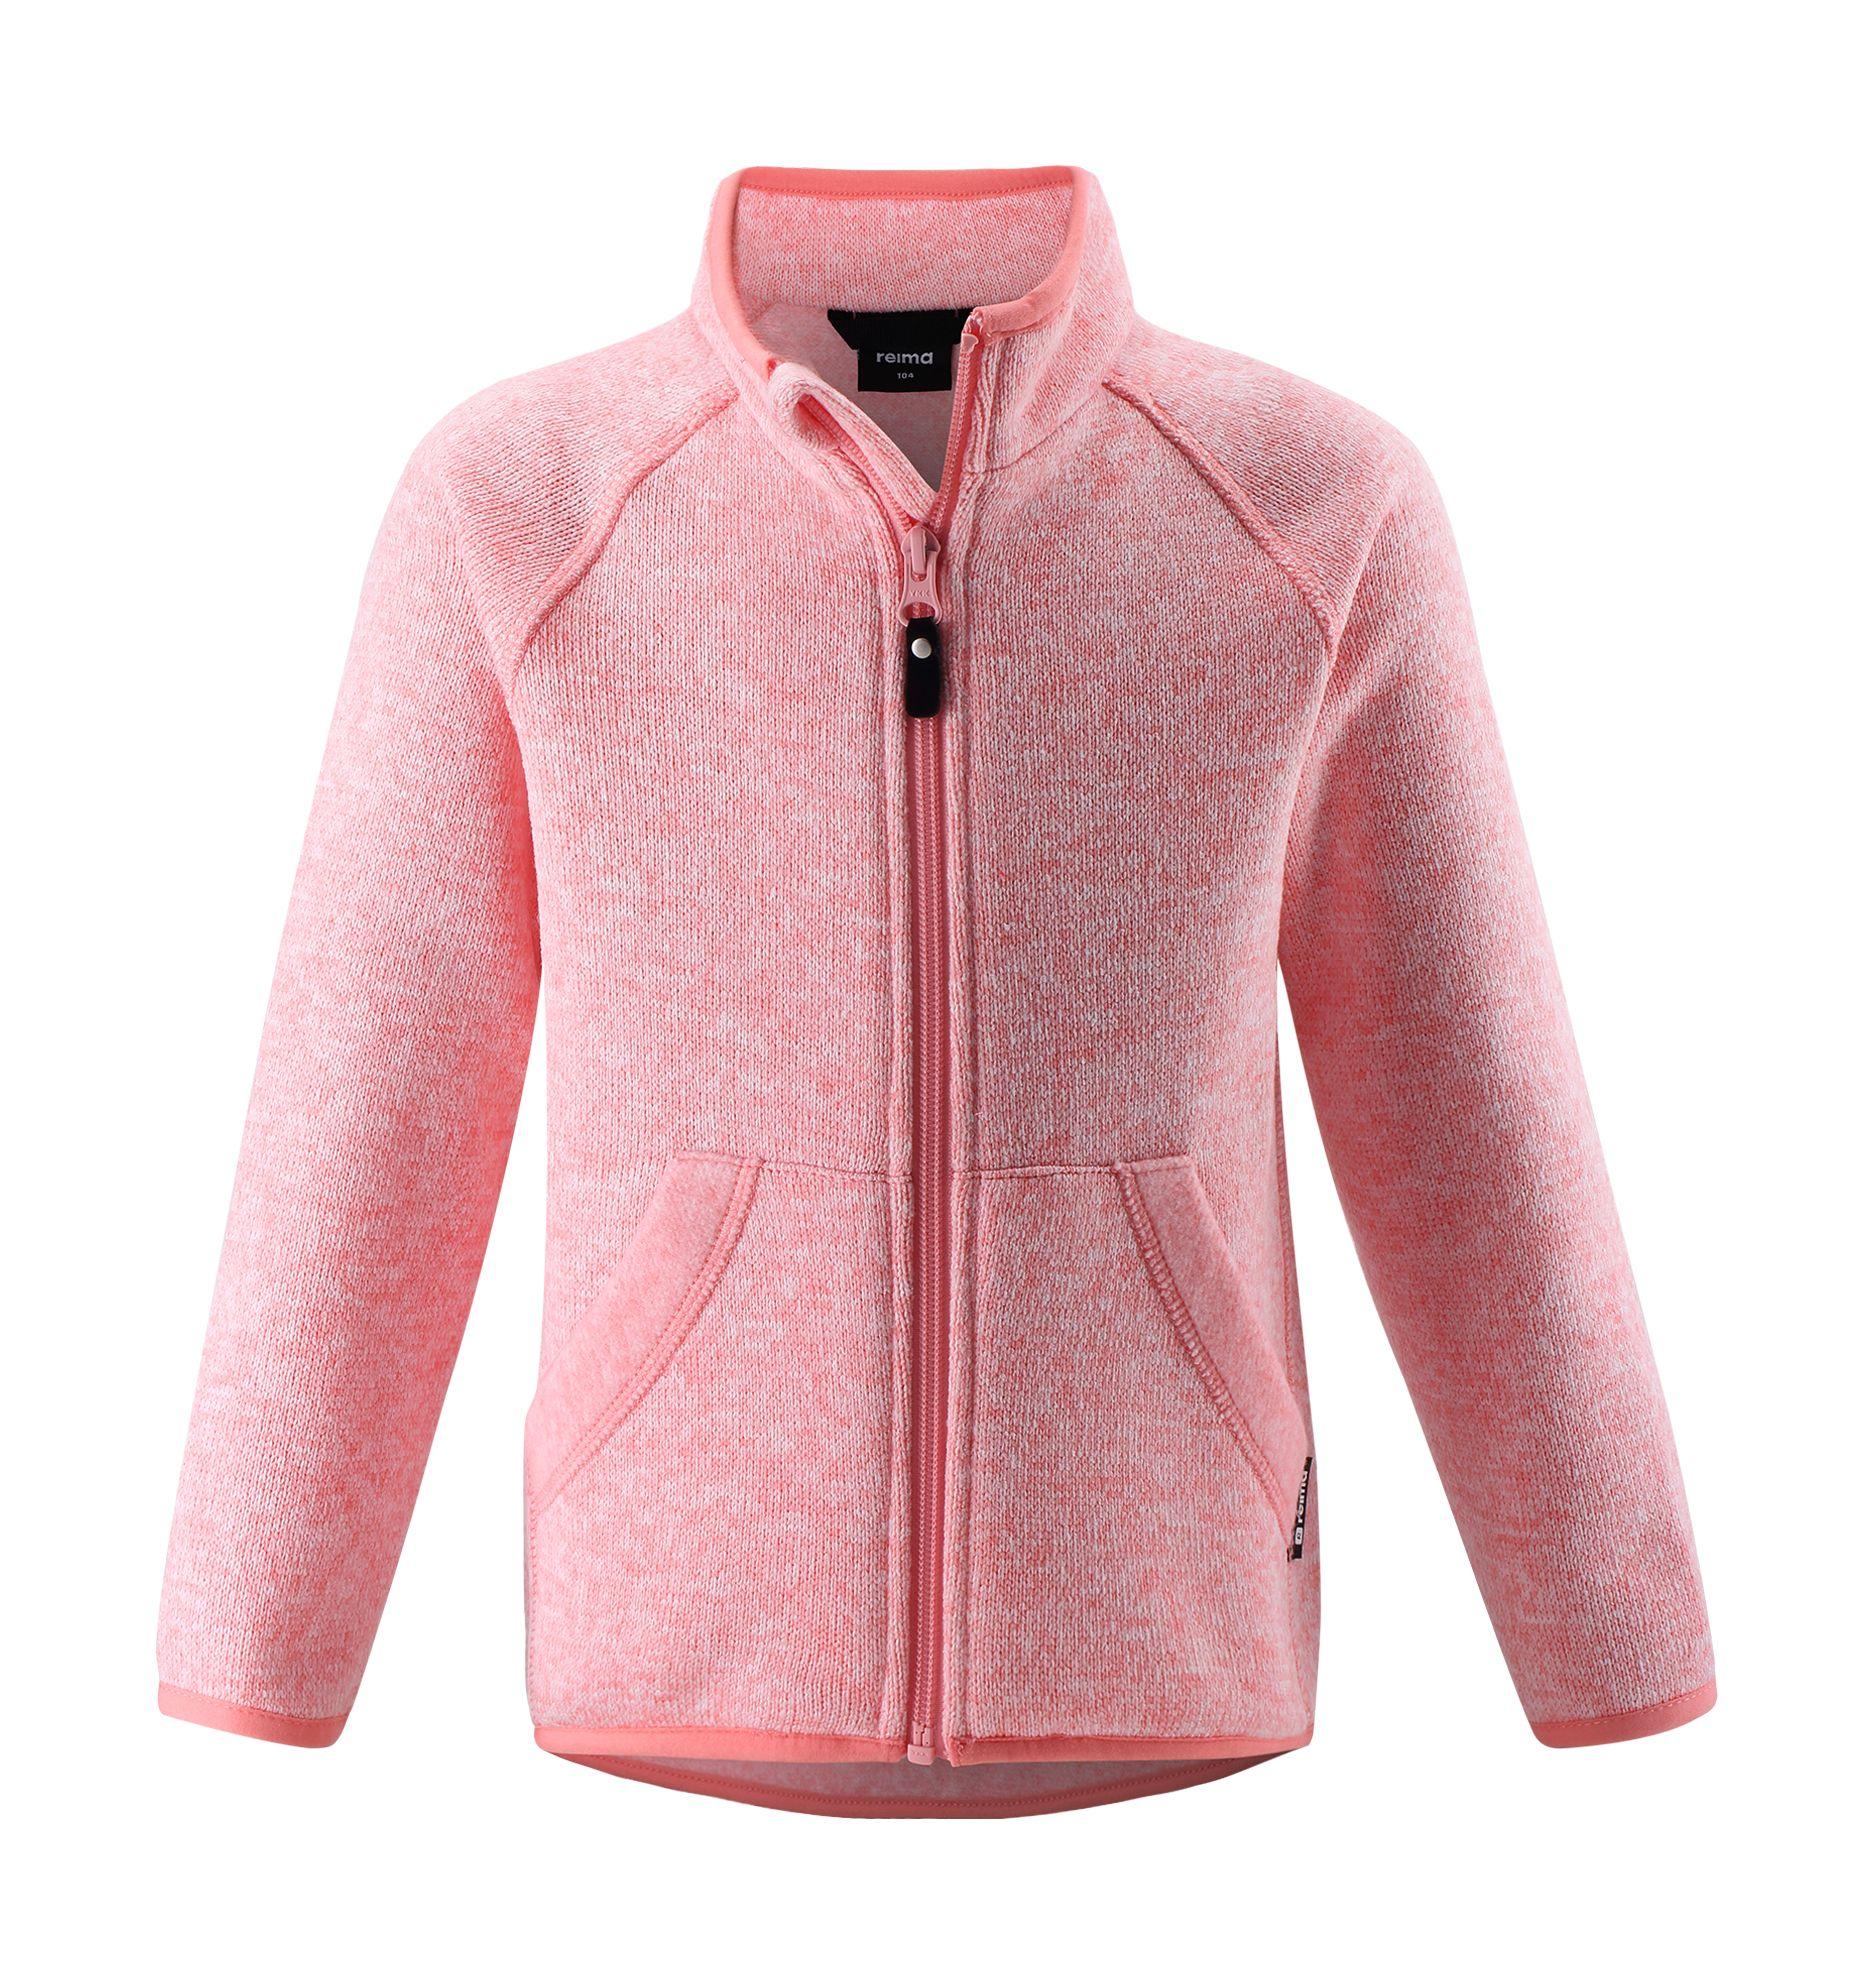 REIMA Hopper Bubblegum Pink 128